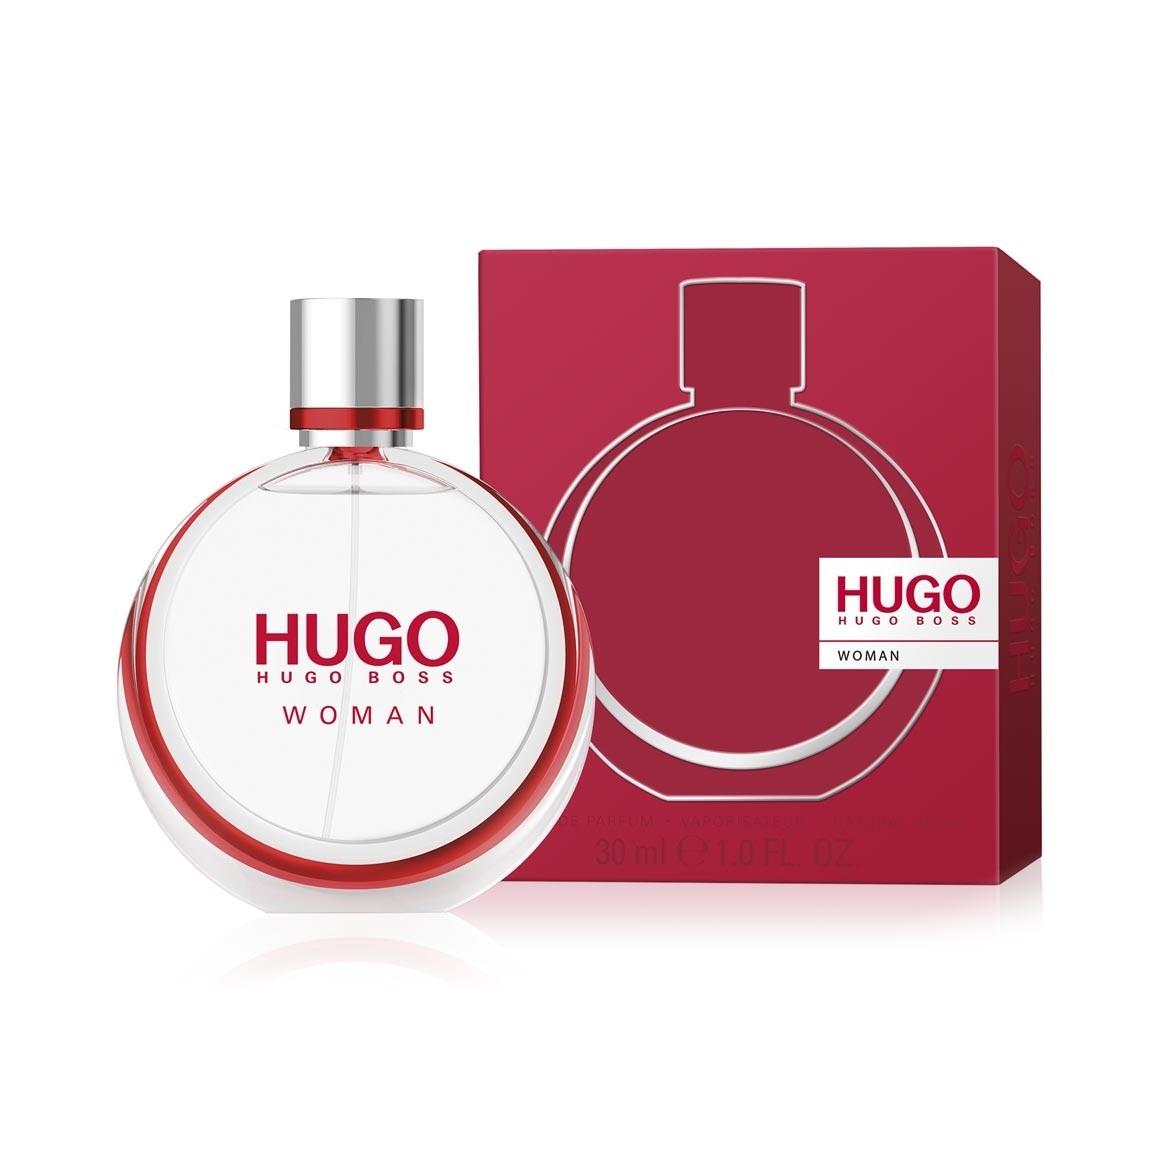 Hugo Boss Hugo Woman, 30ml, Parfémovaná voda